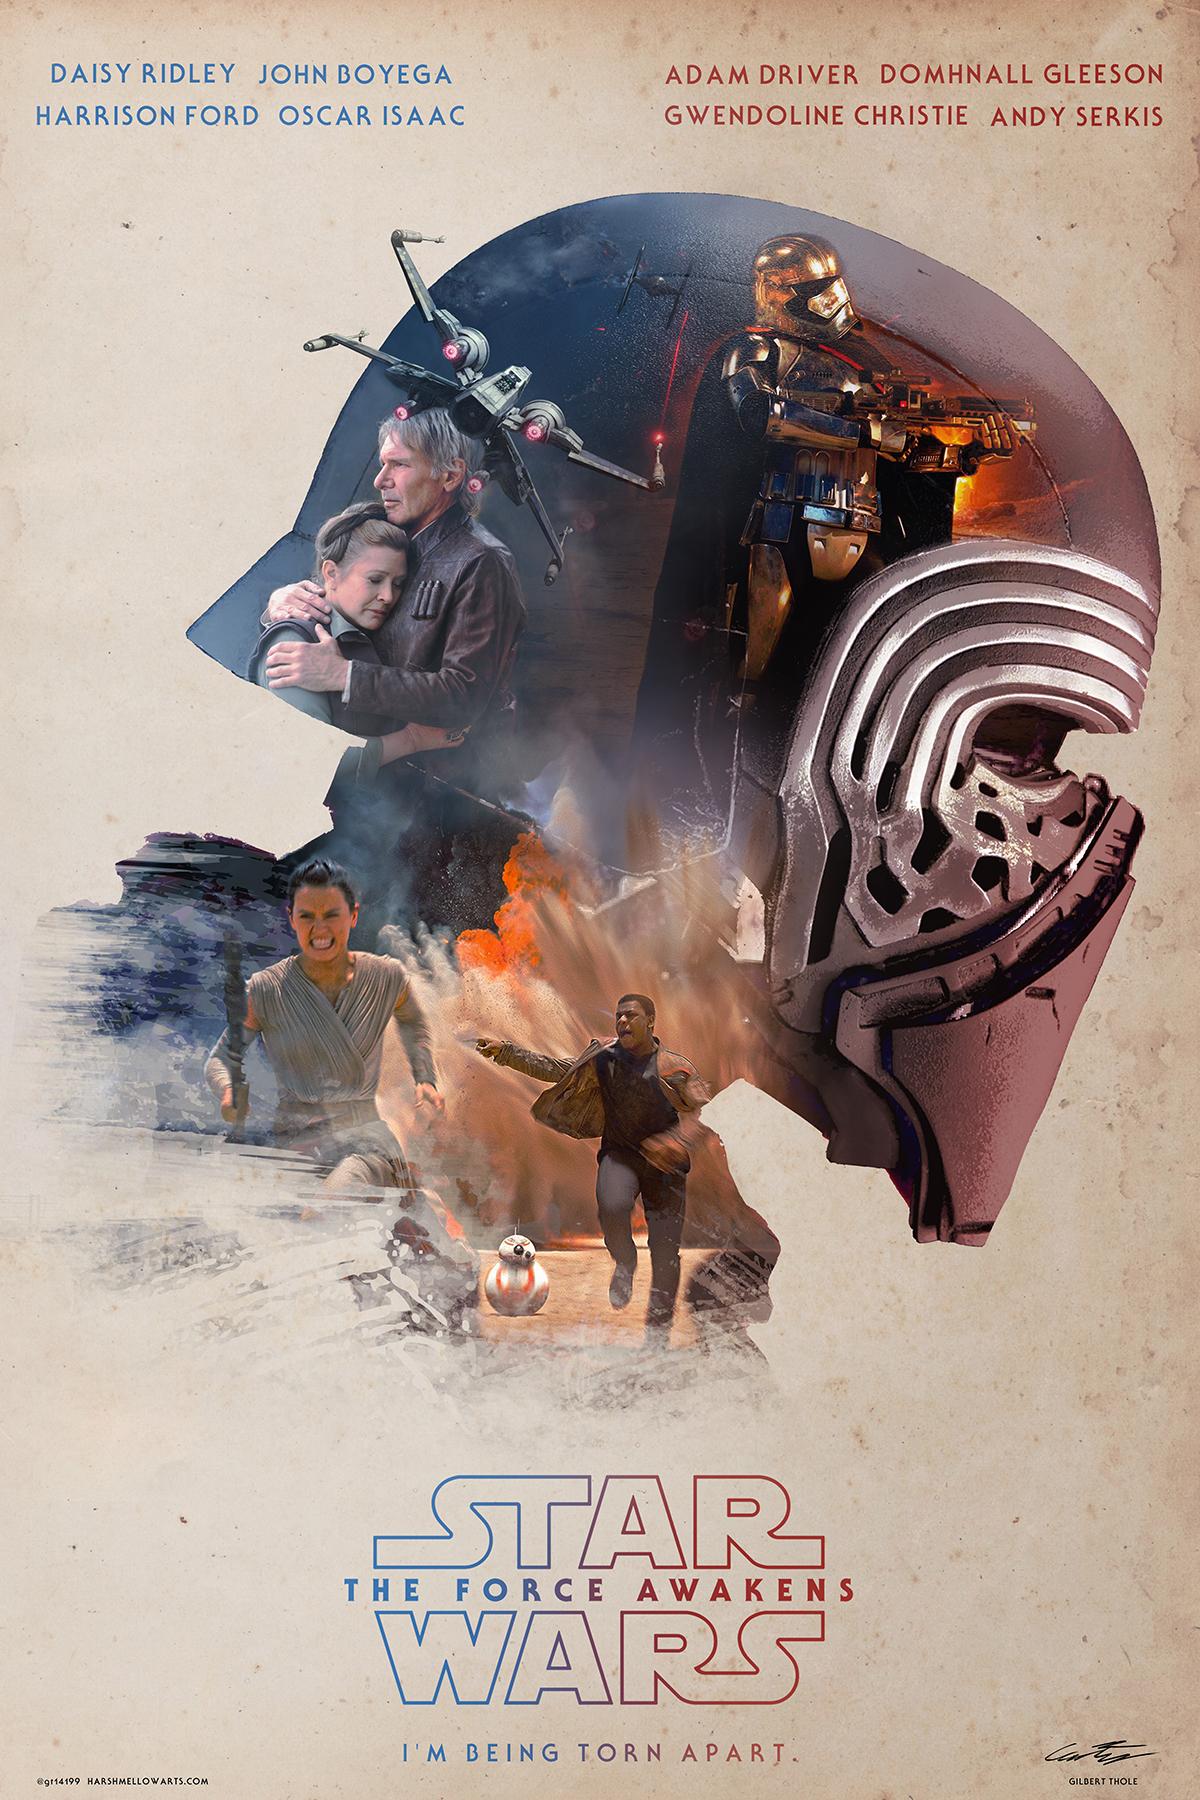 Kylo Ren Sicario Styled Poster On Behance